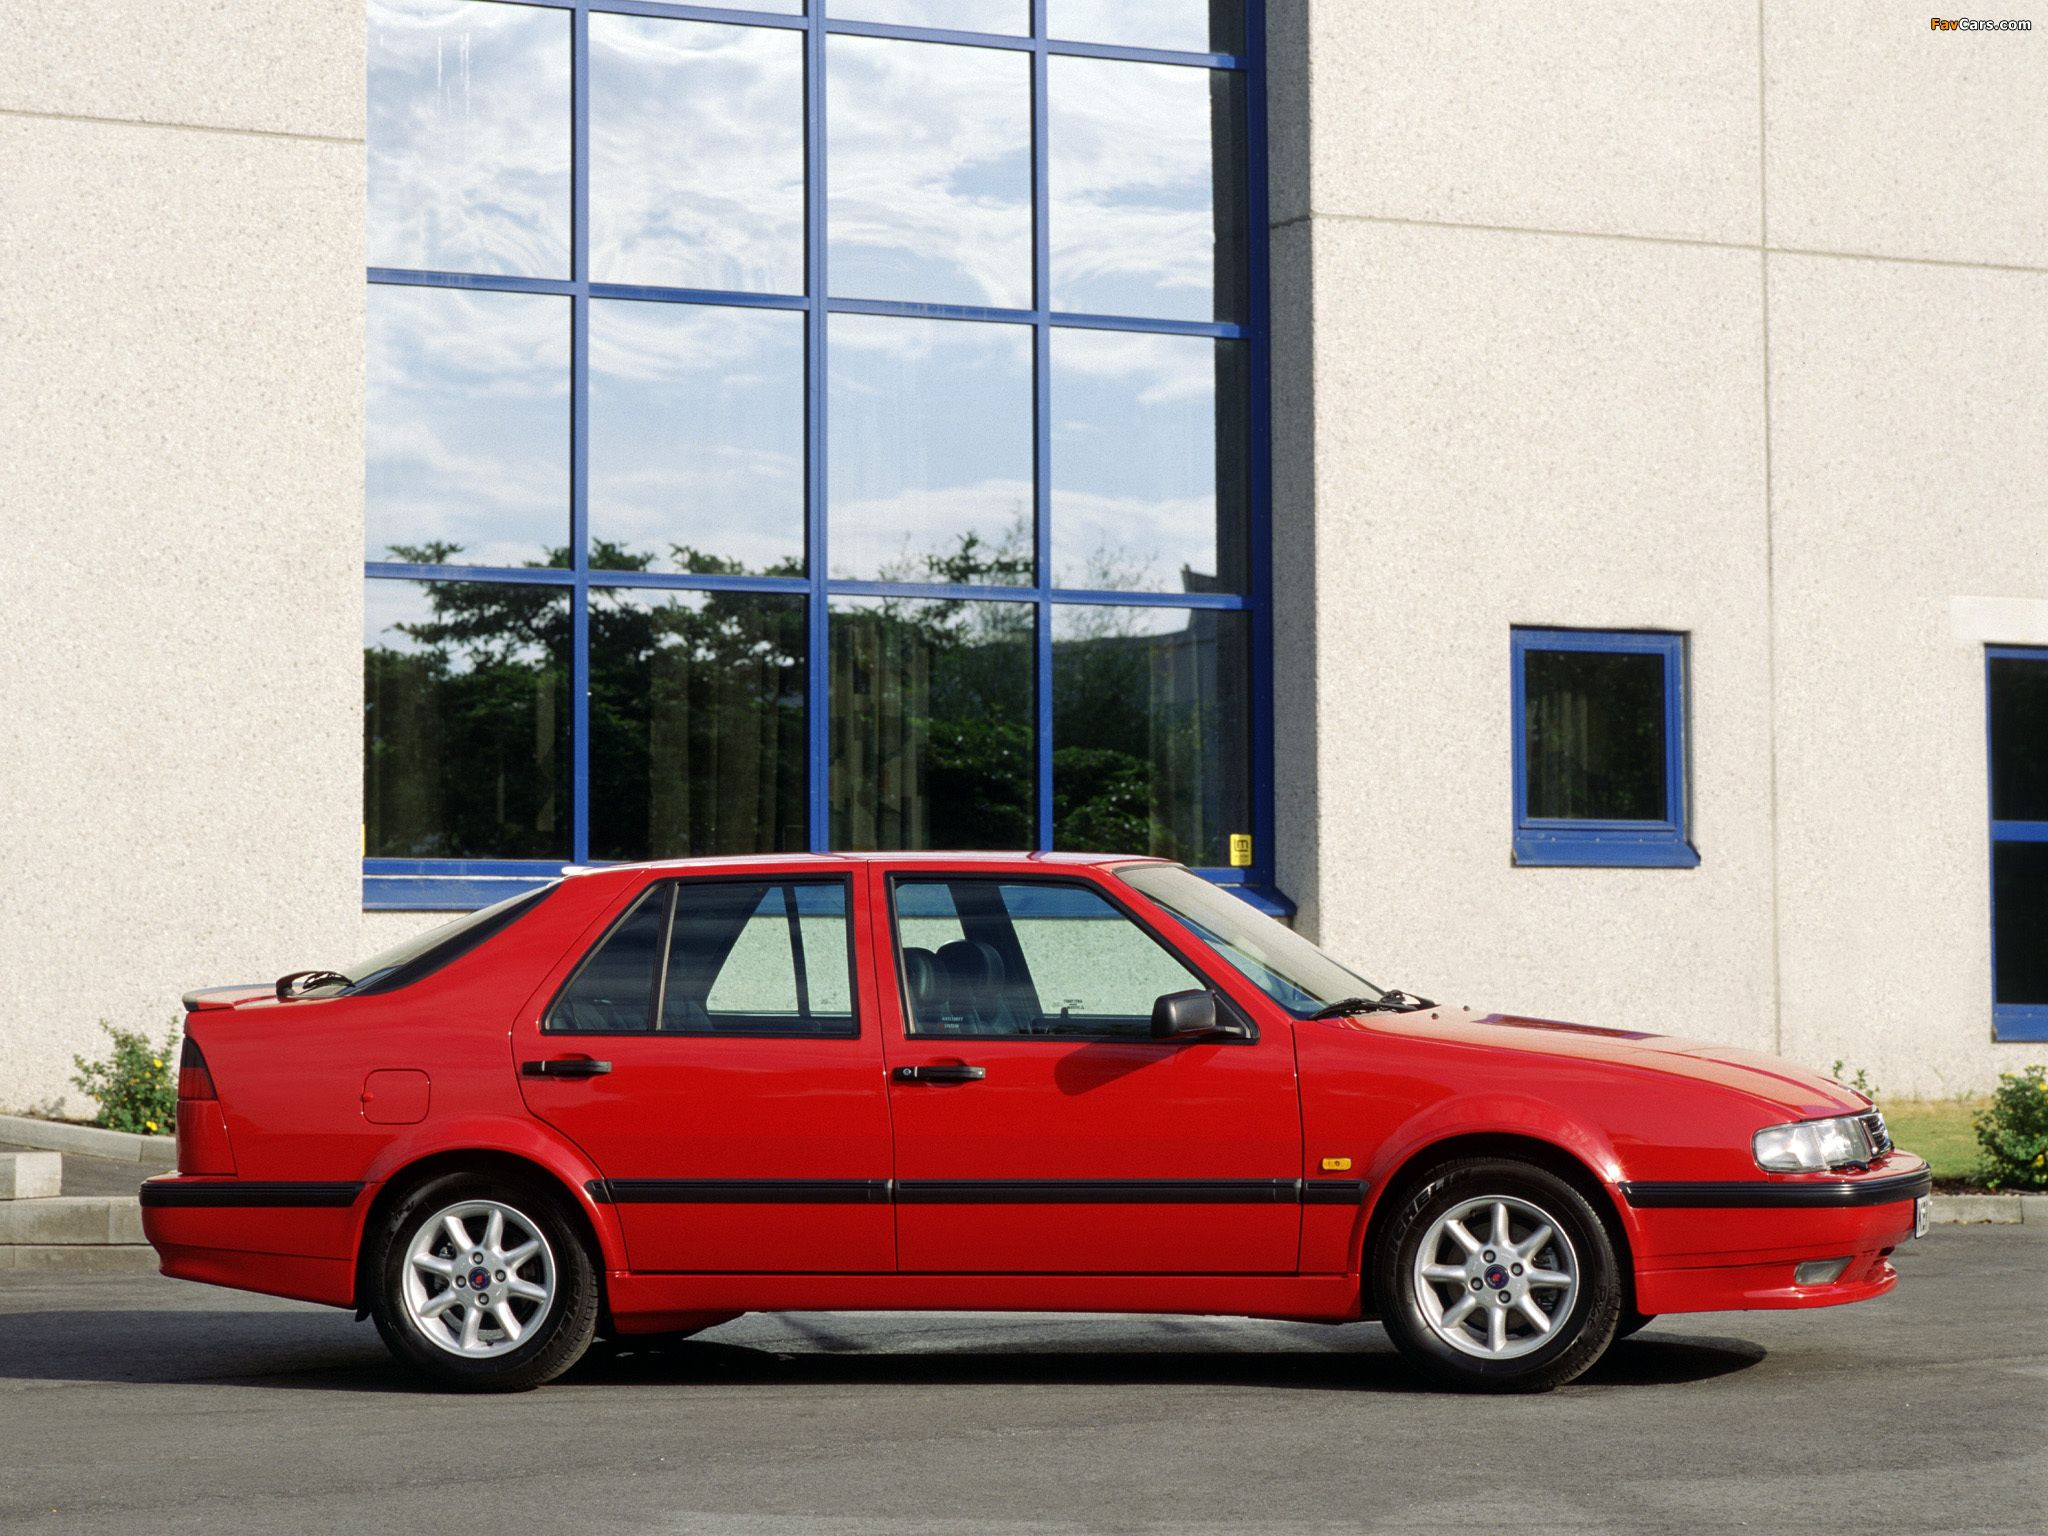 Saab 9000 CSE Anniversary Edition 199698 photos (With